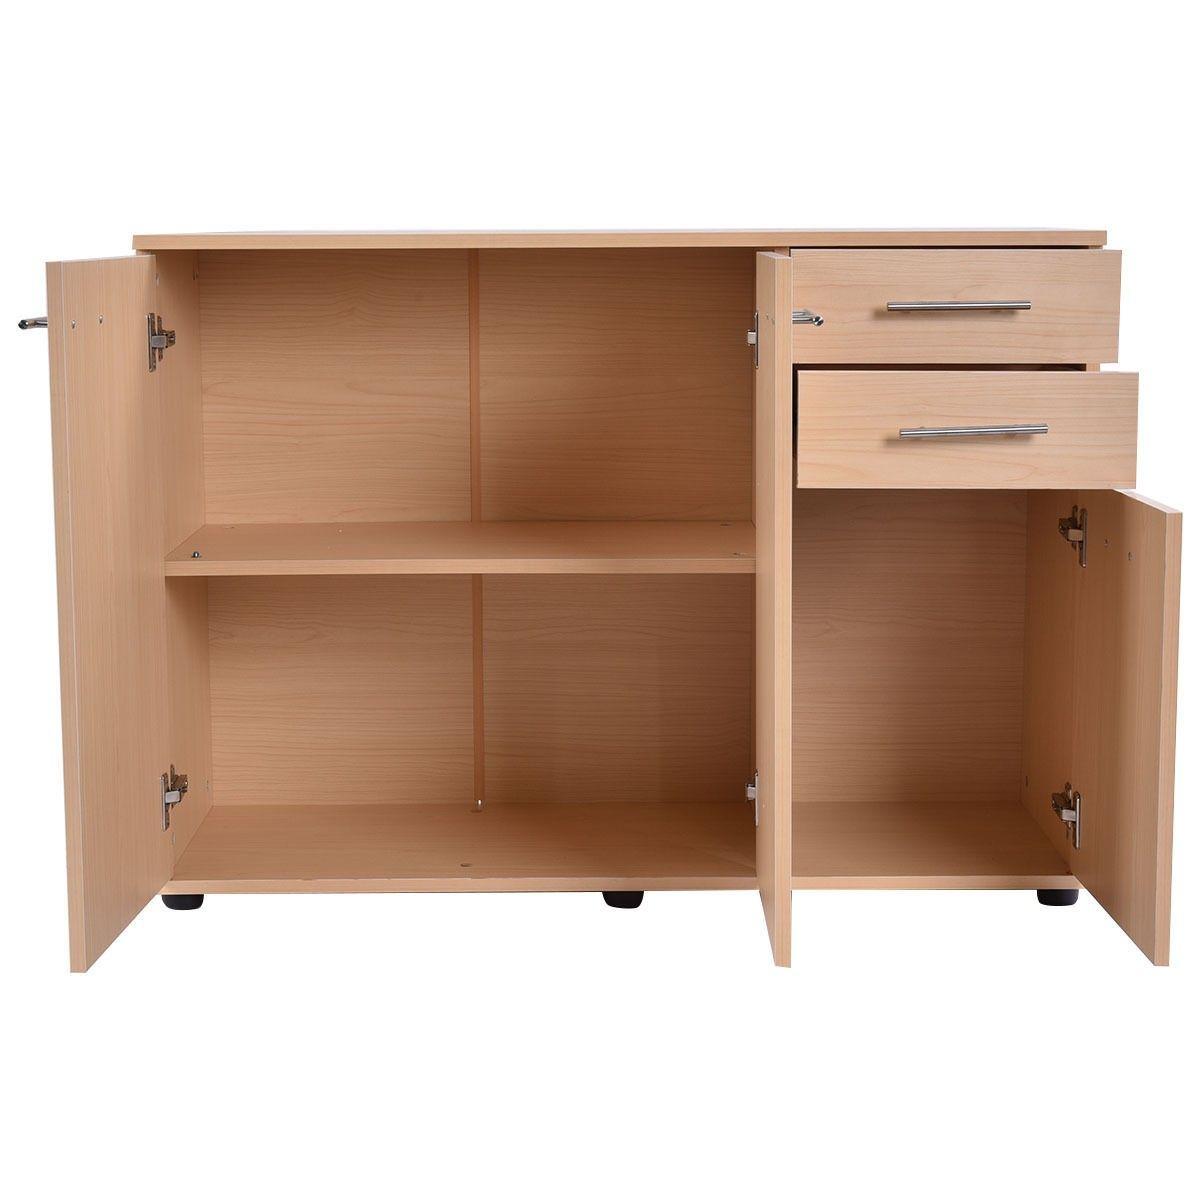 Storage Cabinet Cupboard Organizer Three Doors Double Shelves